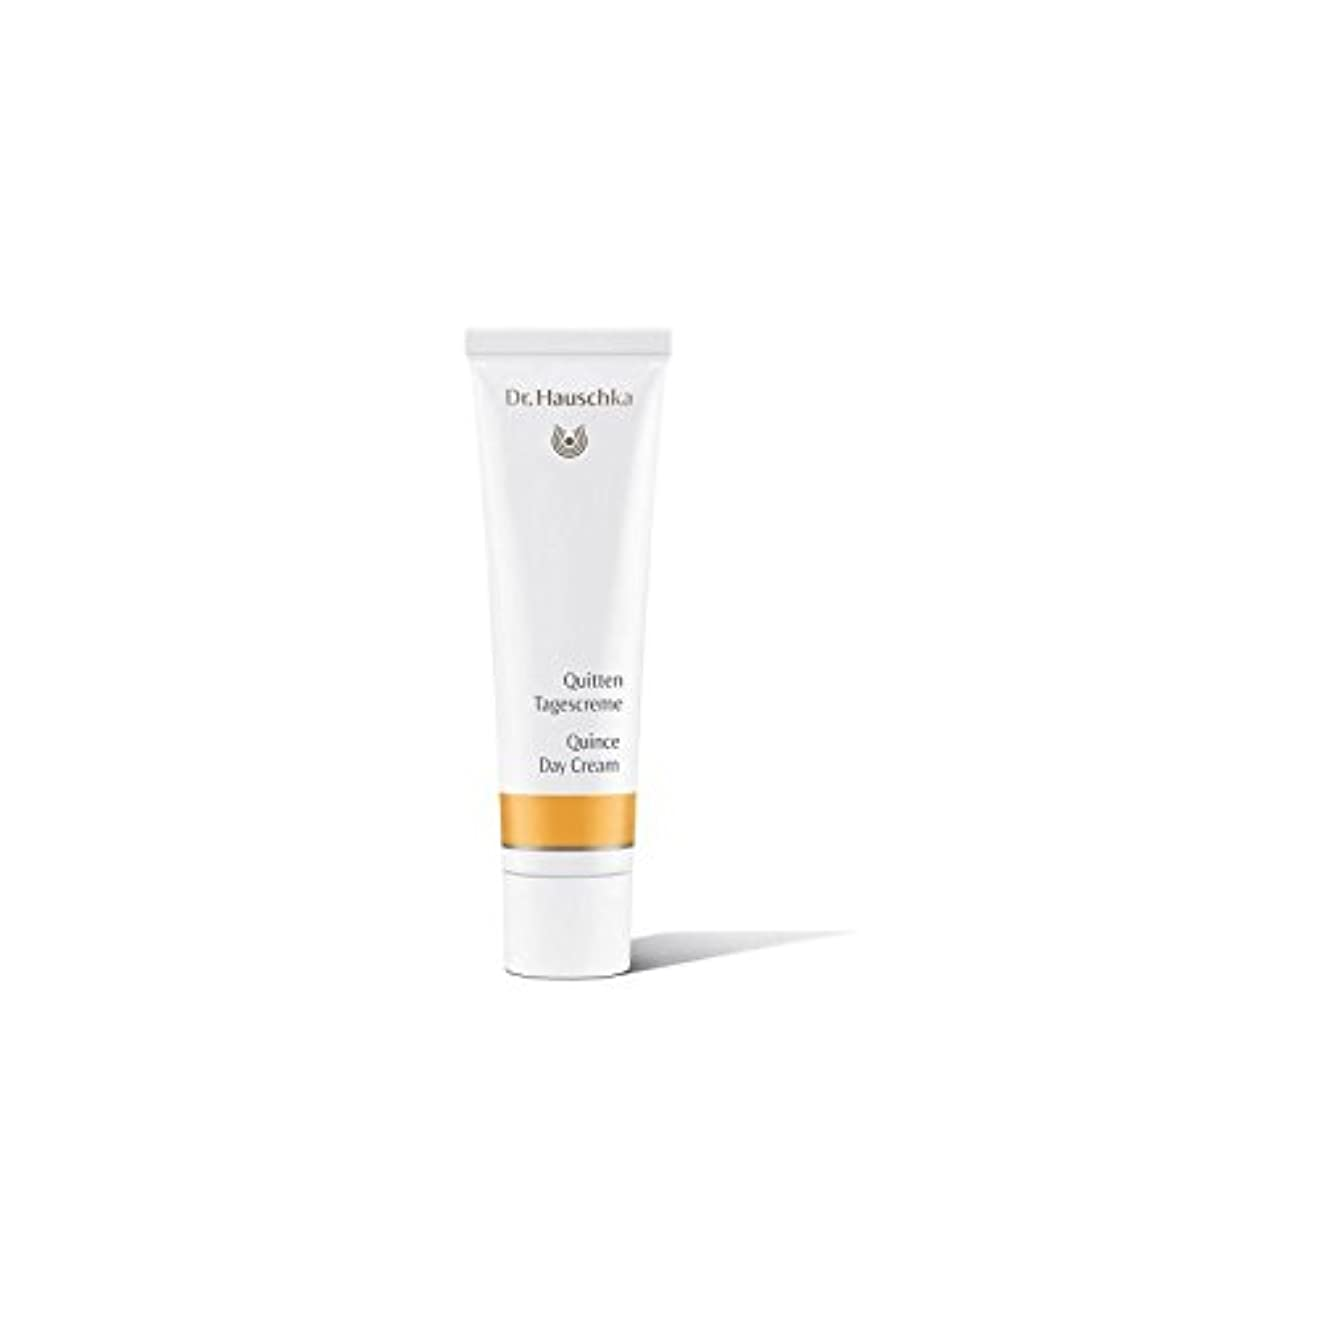 Dr. Hauschka Quince Day Cream 30ml (Pack of 6) - ハウシュカクインスデイクリーム30 x6 [並行輸入品]